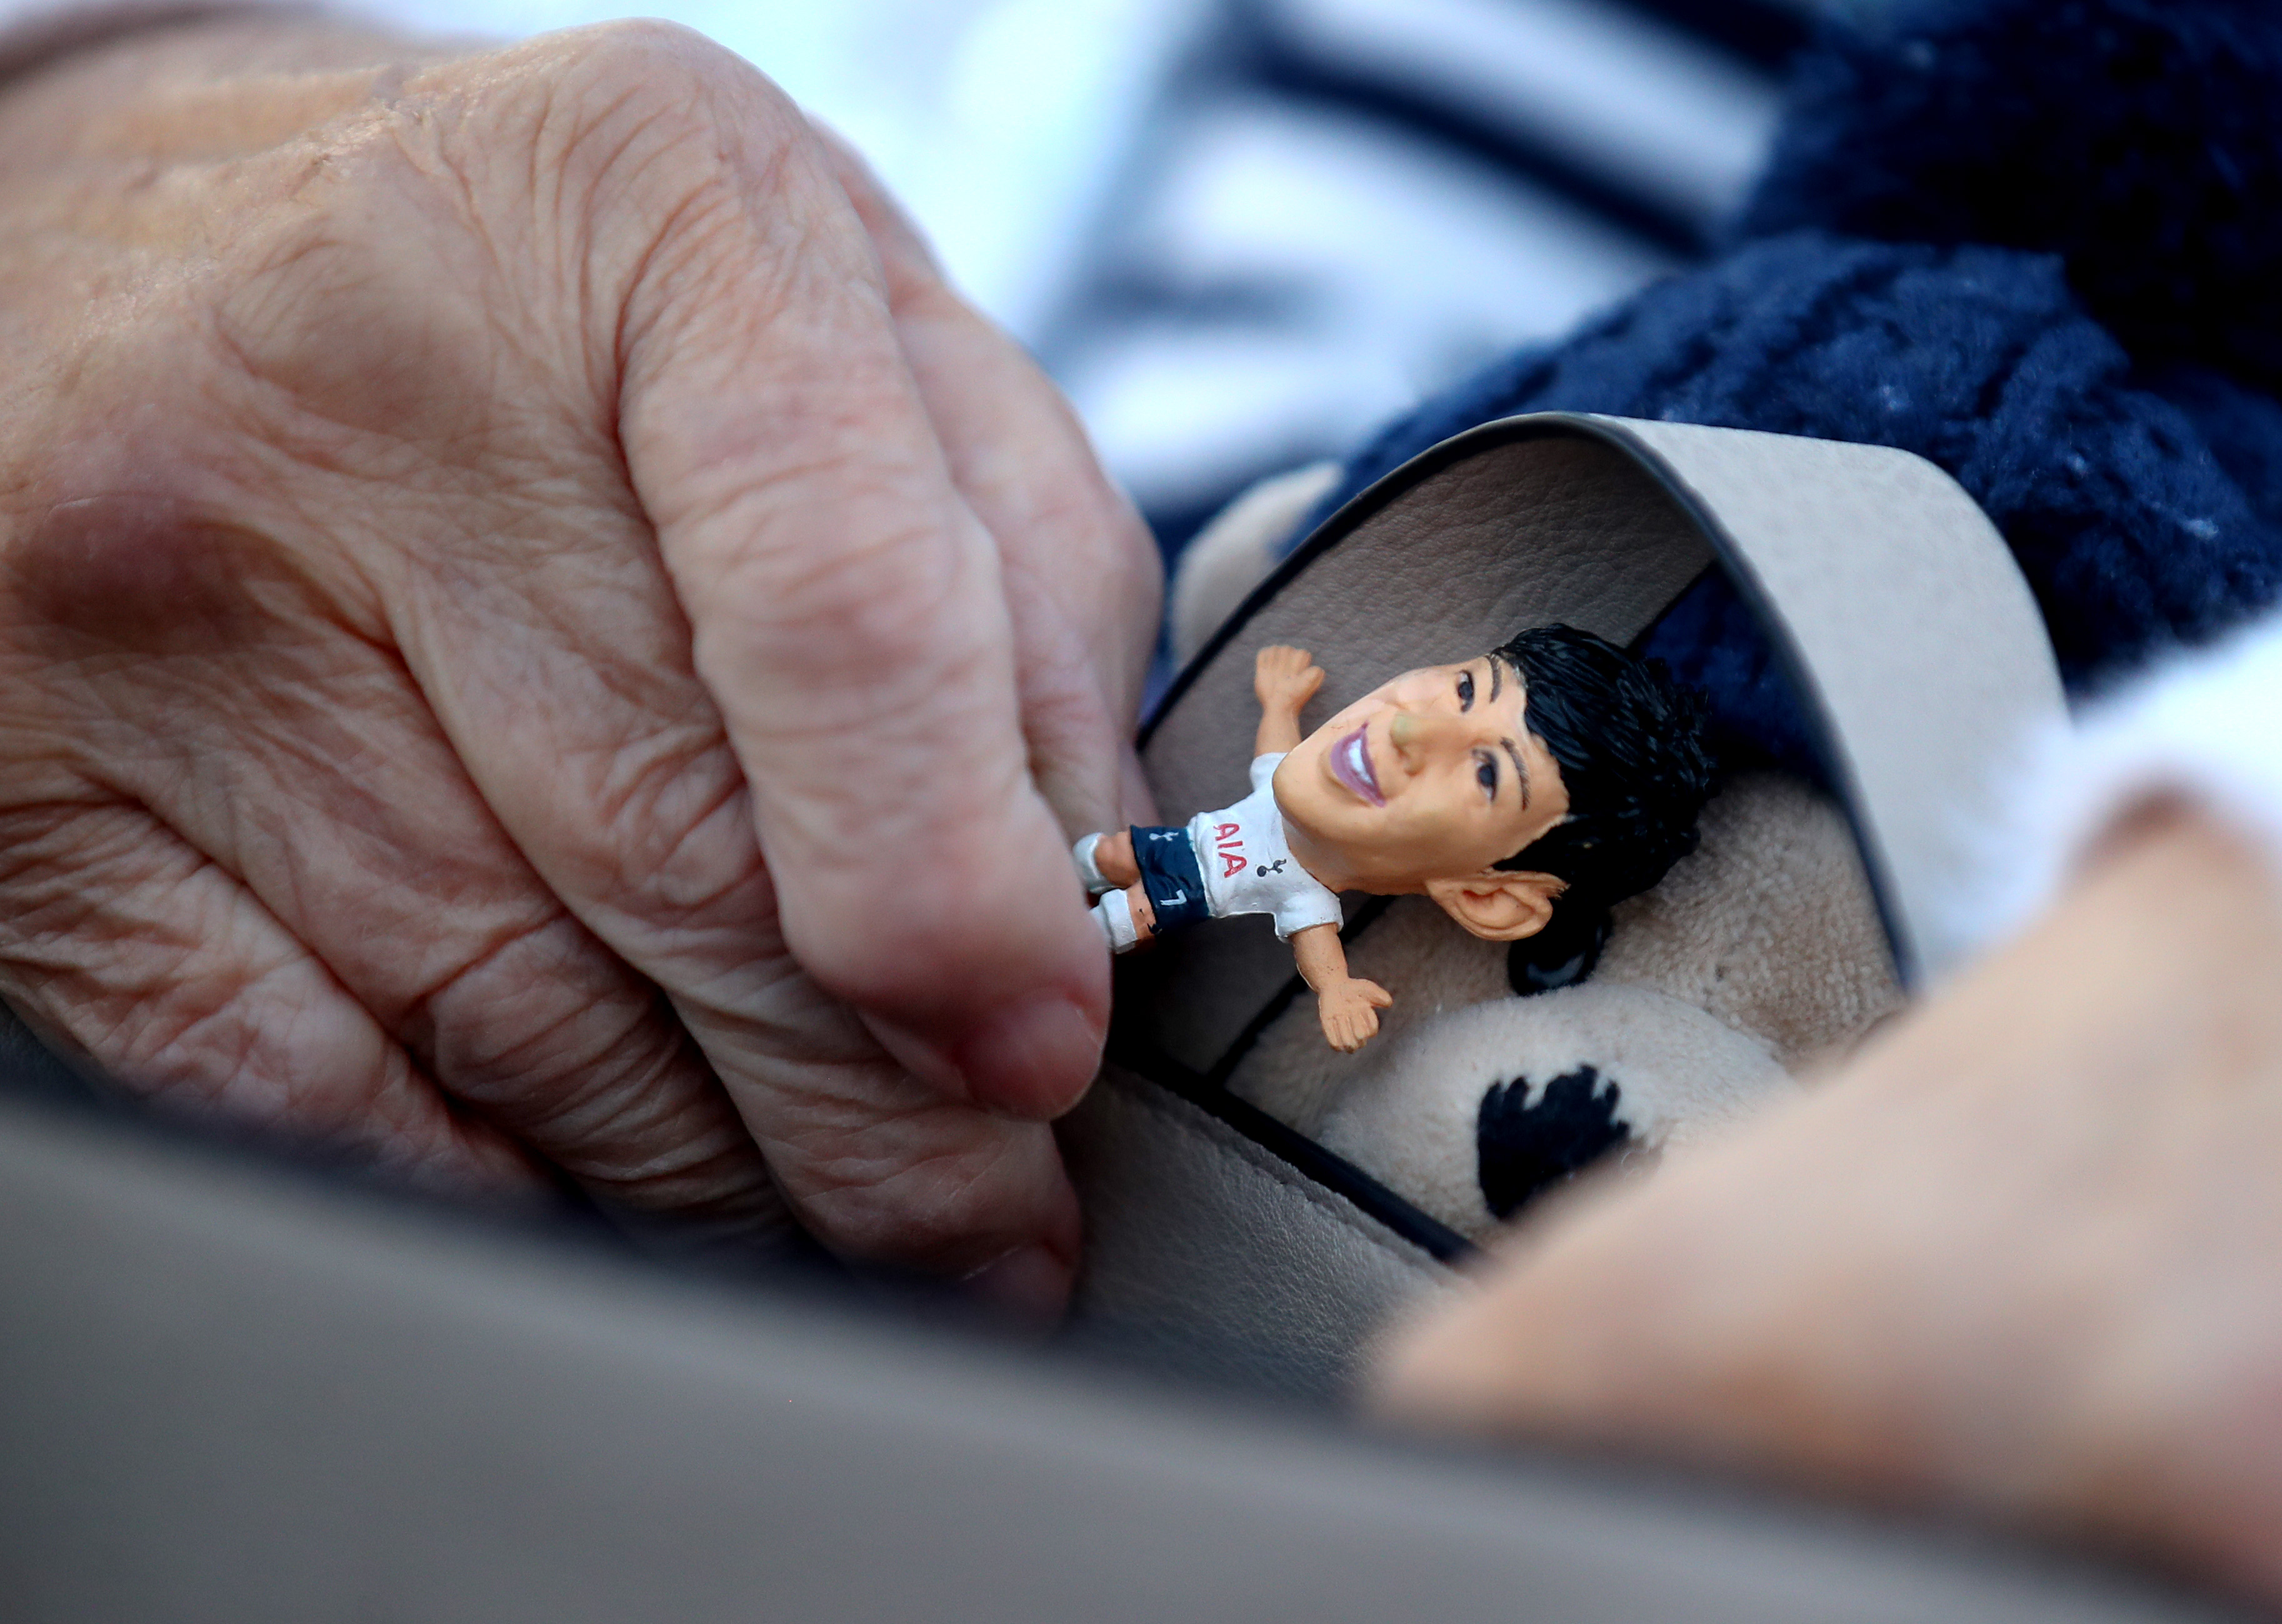 Miniature figure of Hueng Min Son - Tottenham Hotspur - Premier League